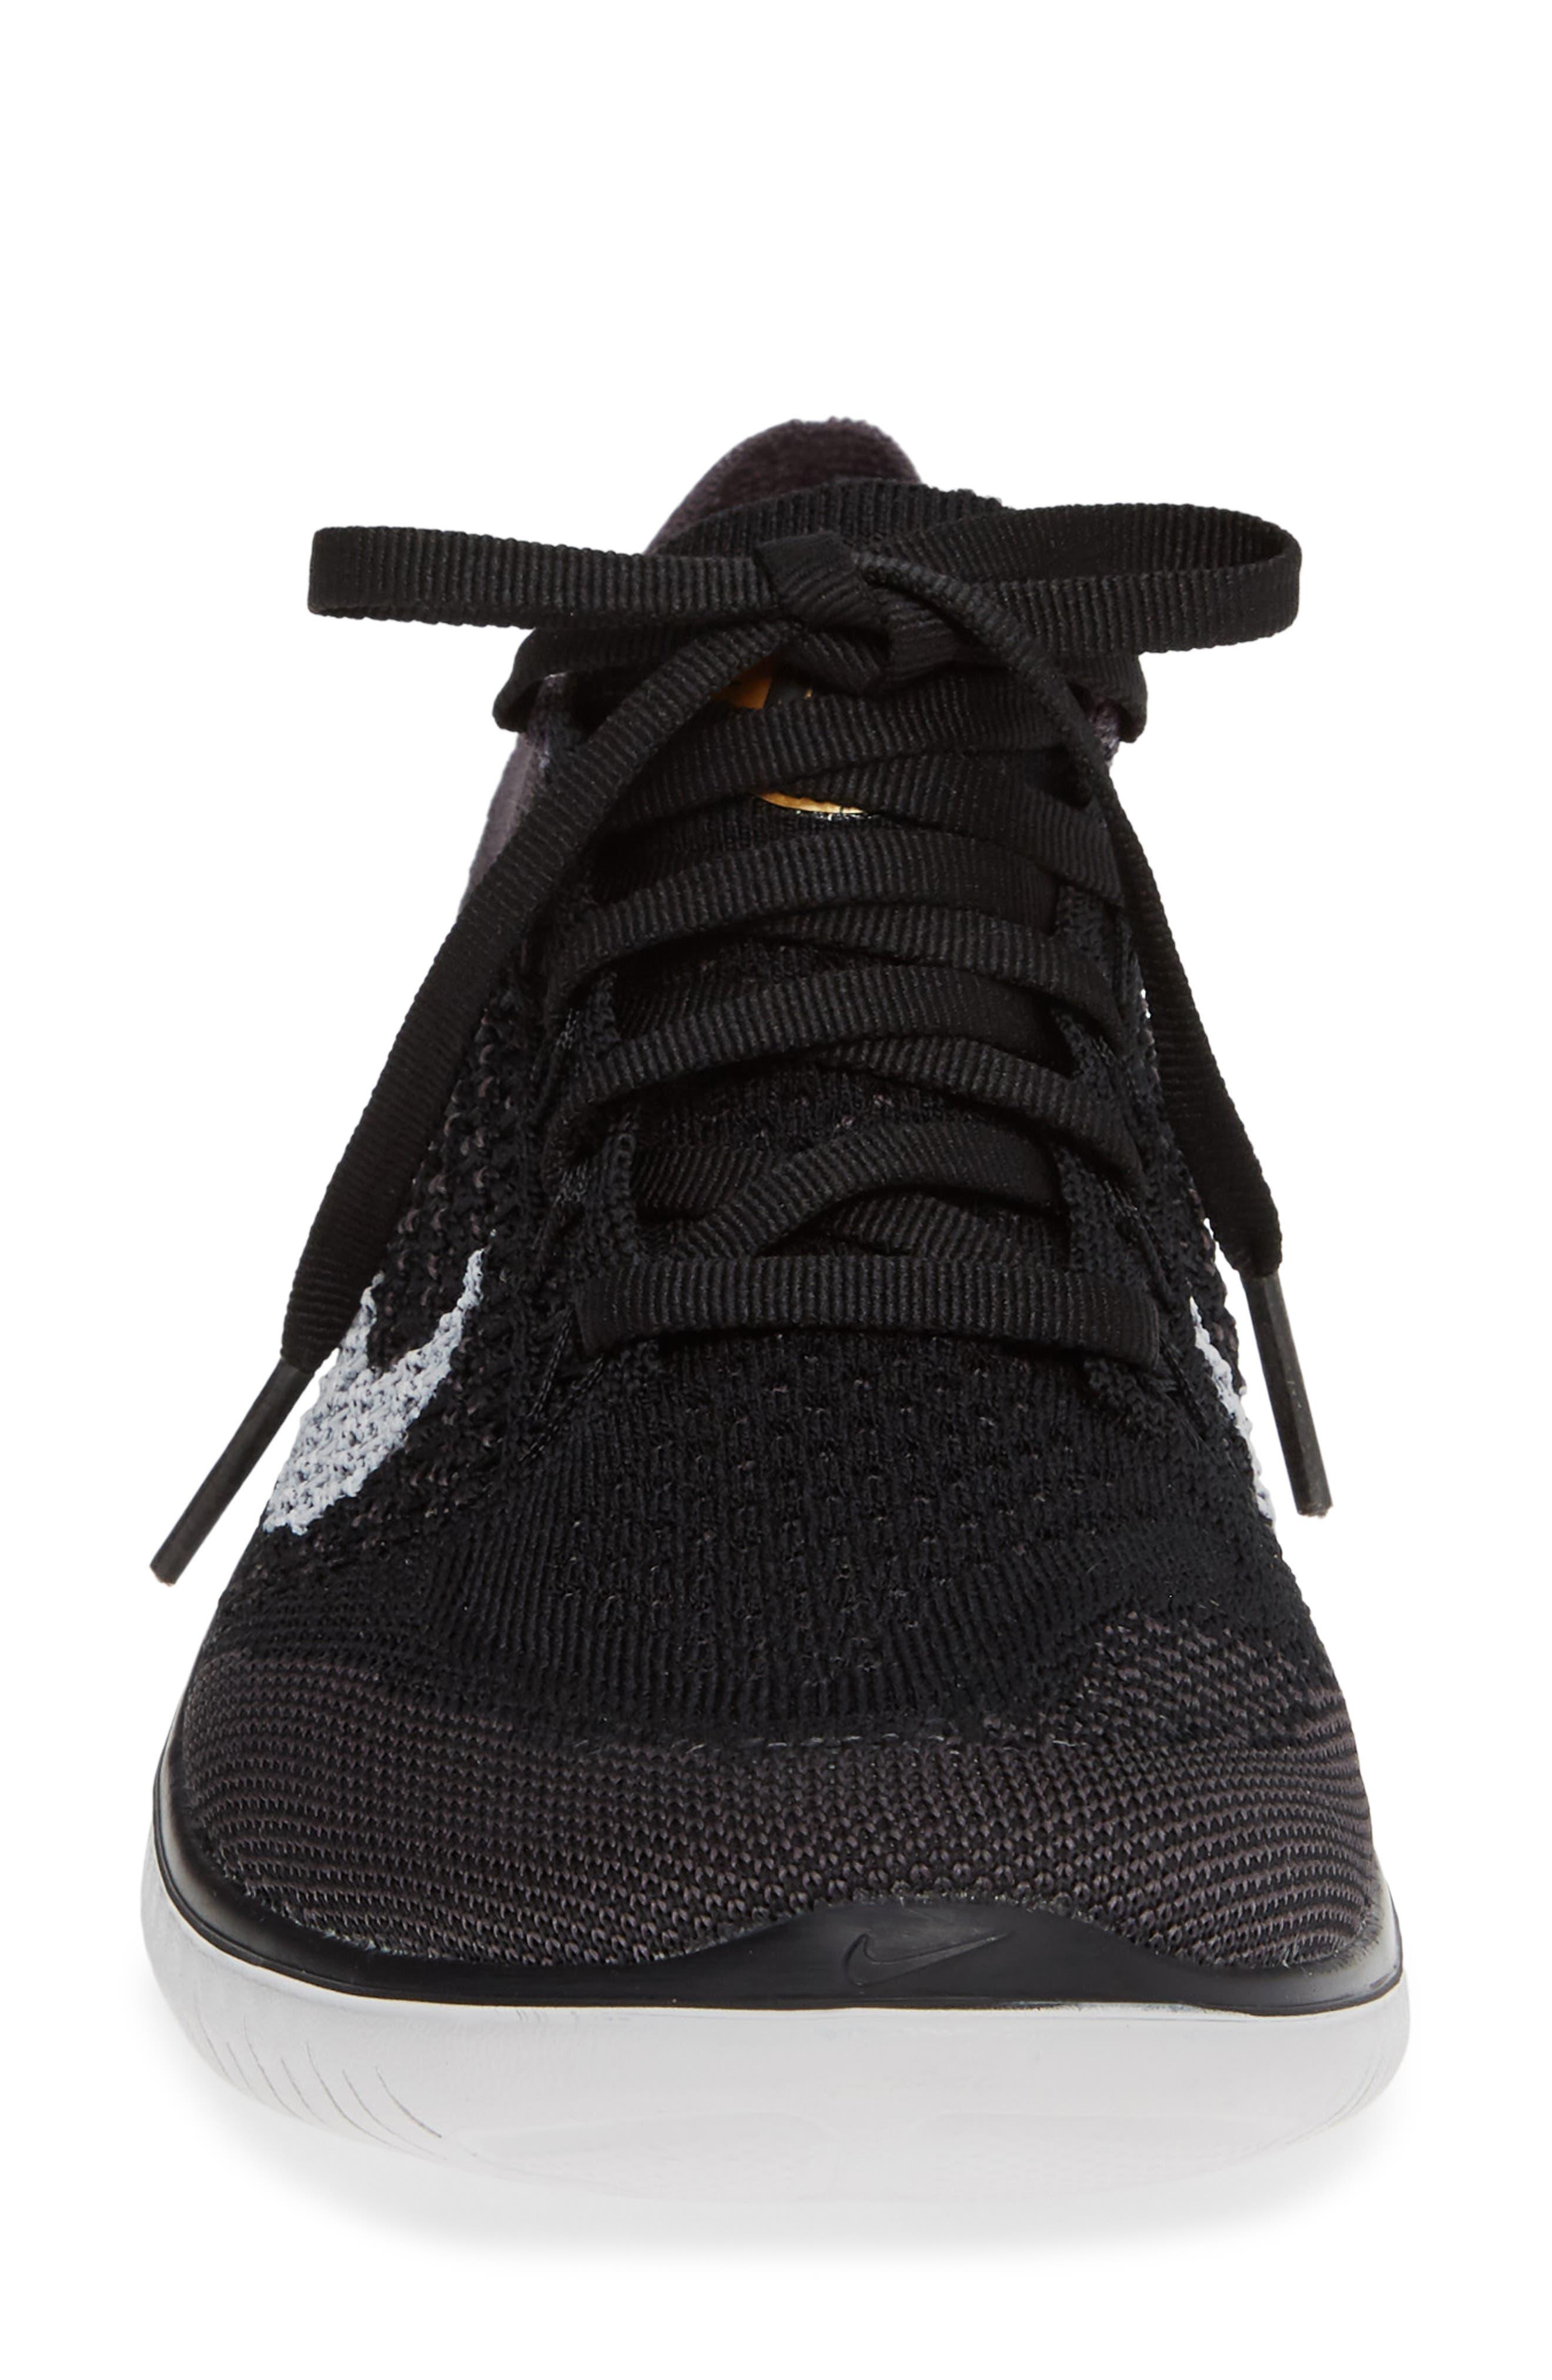 ,                             Free RN Flyknit 2018 Running Shoe,                             Alternate thumbnail 4, color,                             BLACK/ VAST GREY/ GOLD